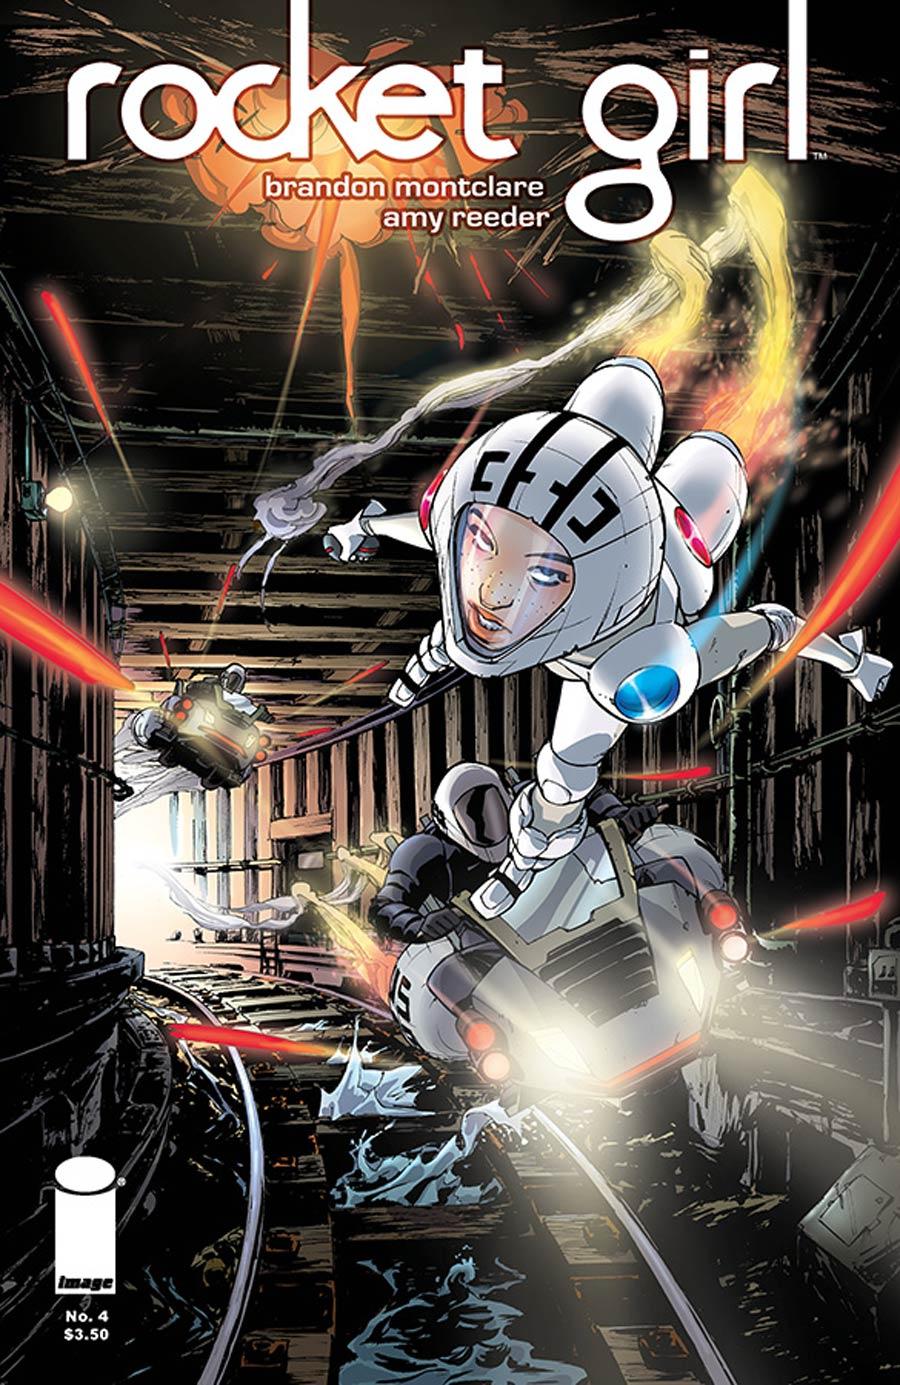 Rocket Girl #4